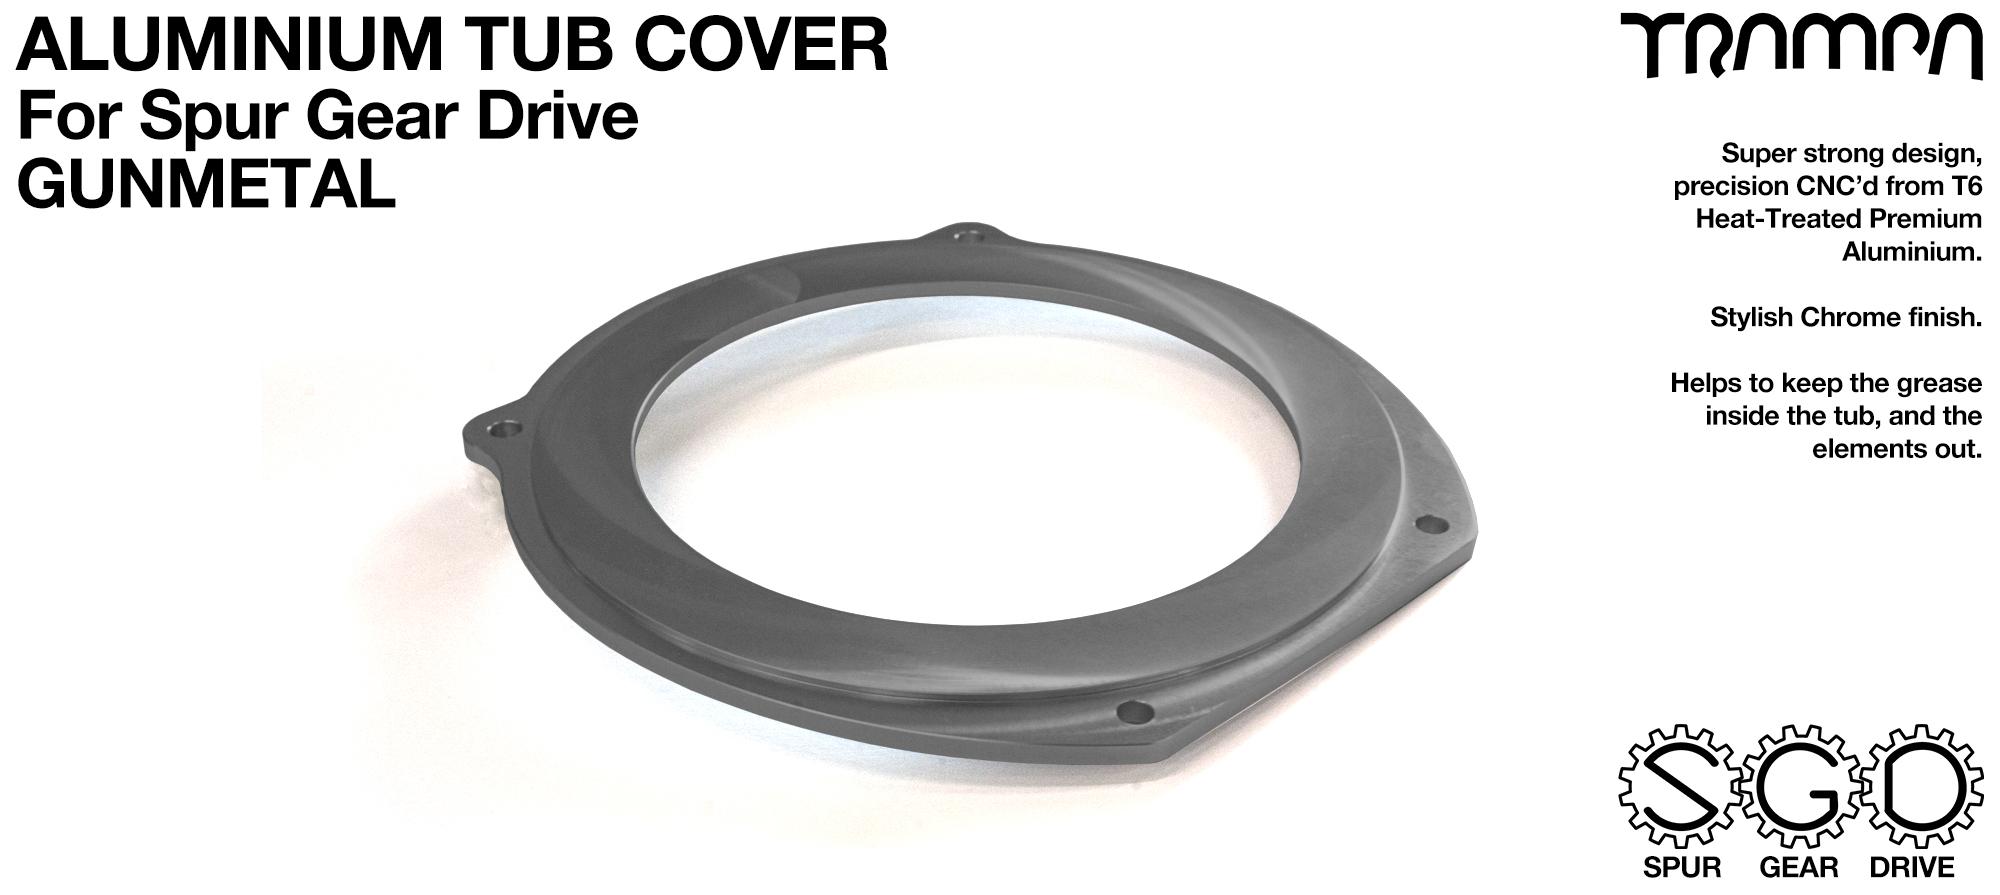 TRAMPA MKII Spur Gear Drive T6 Aluminium Tub Cover - GUNMETAL